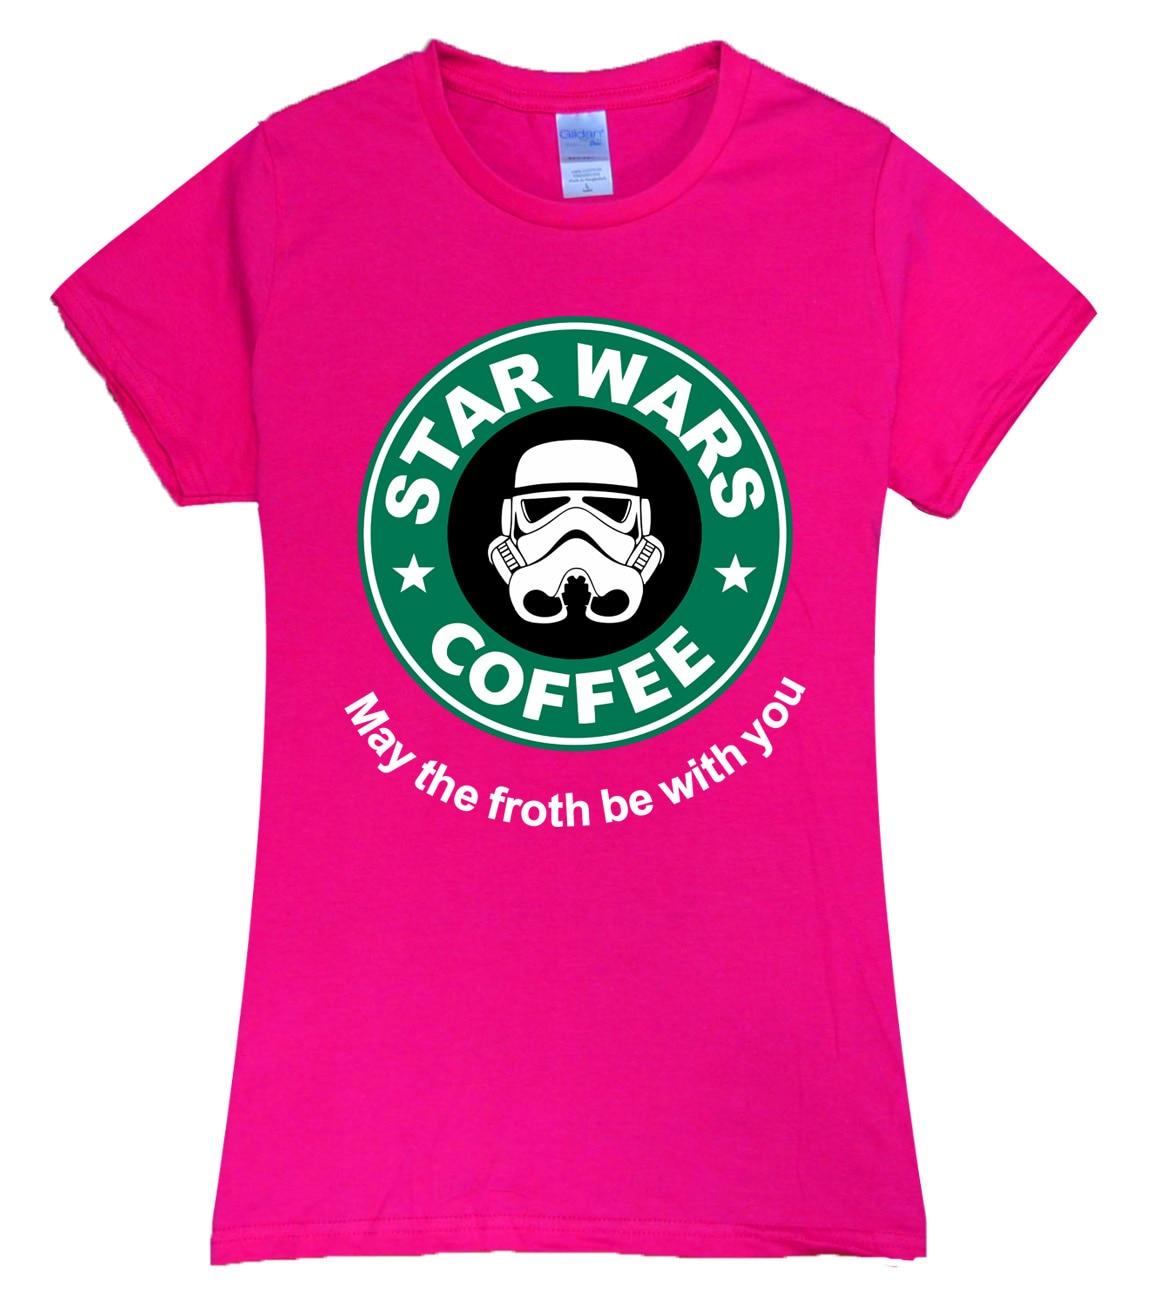 Black t shirt grunge - Cool Star War Coffee 2017 Summer New Sexy T Shirt Women Brand Tops Harajuku Tee Pink Shirt Funny Angel Grunge Femme Black White